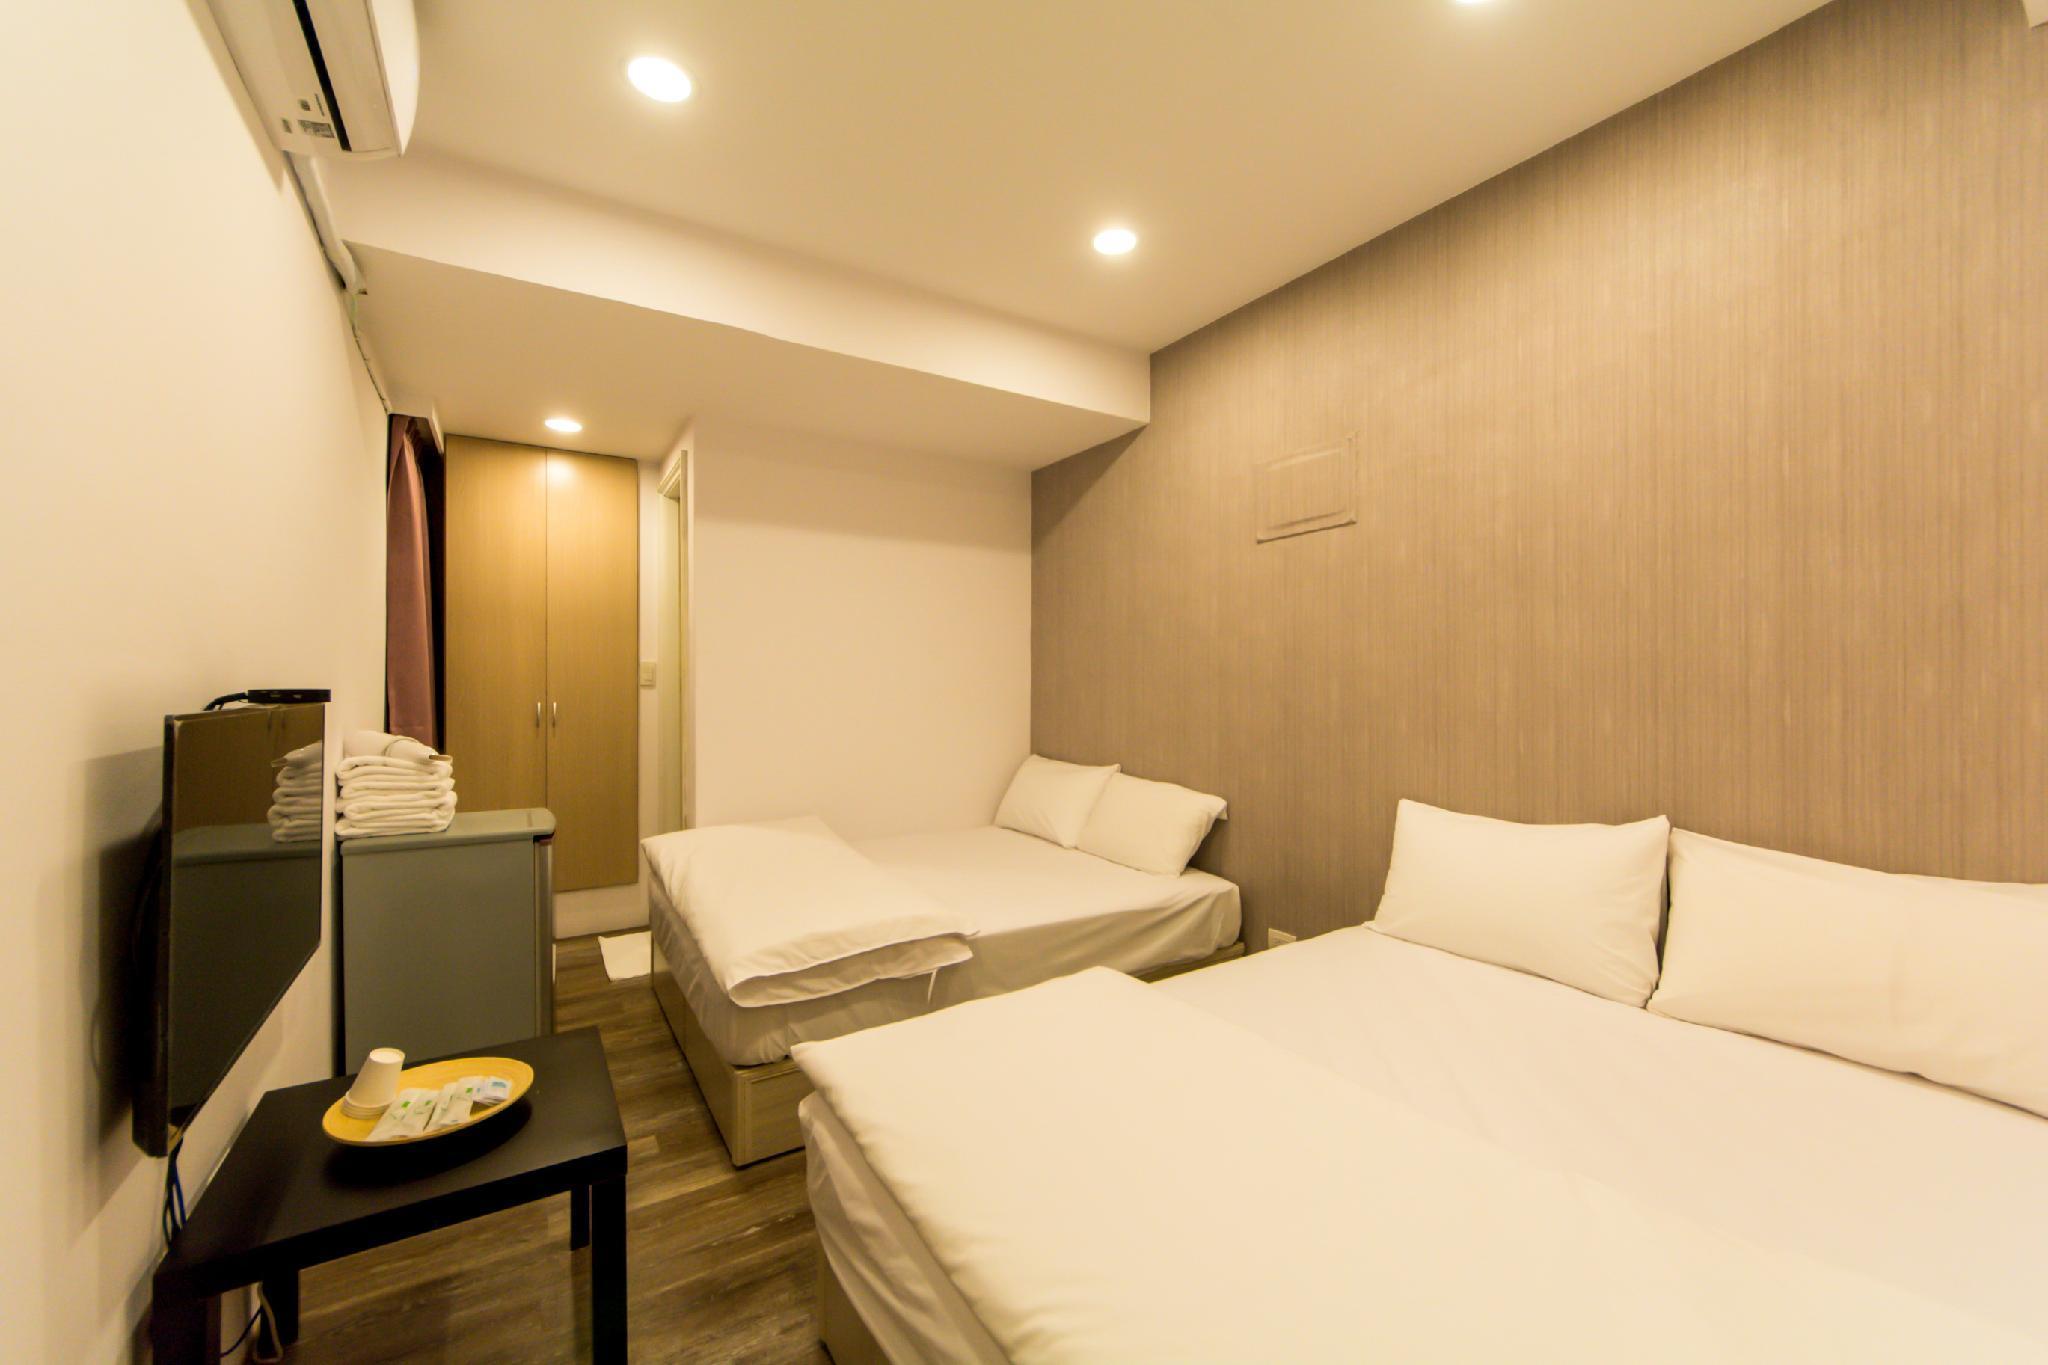 JJ Quad Room W01